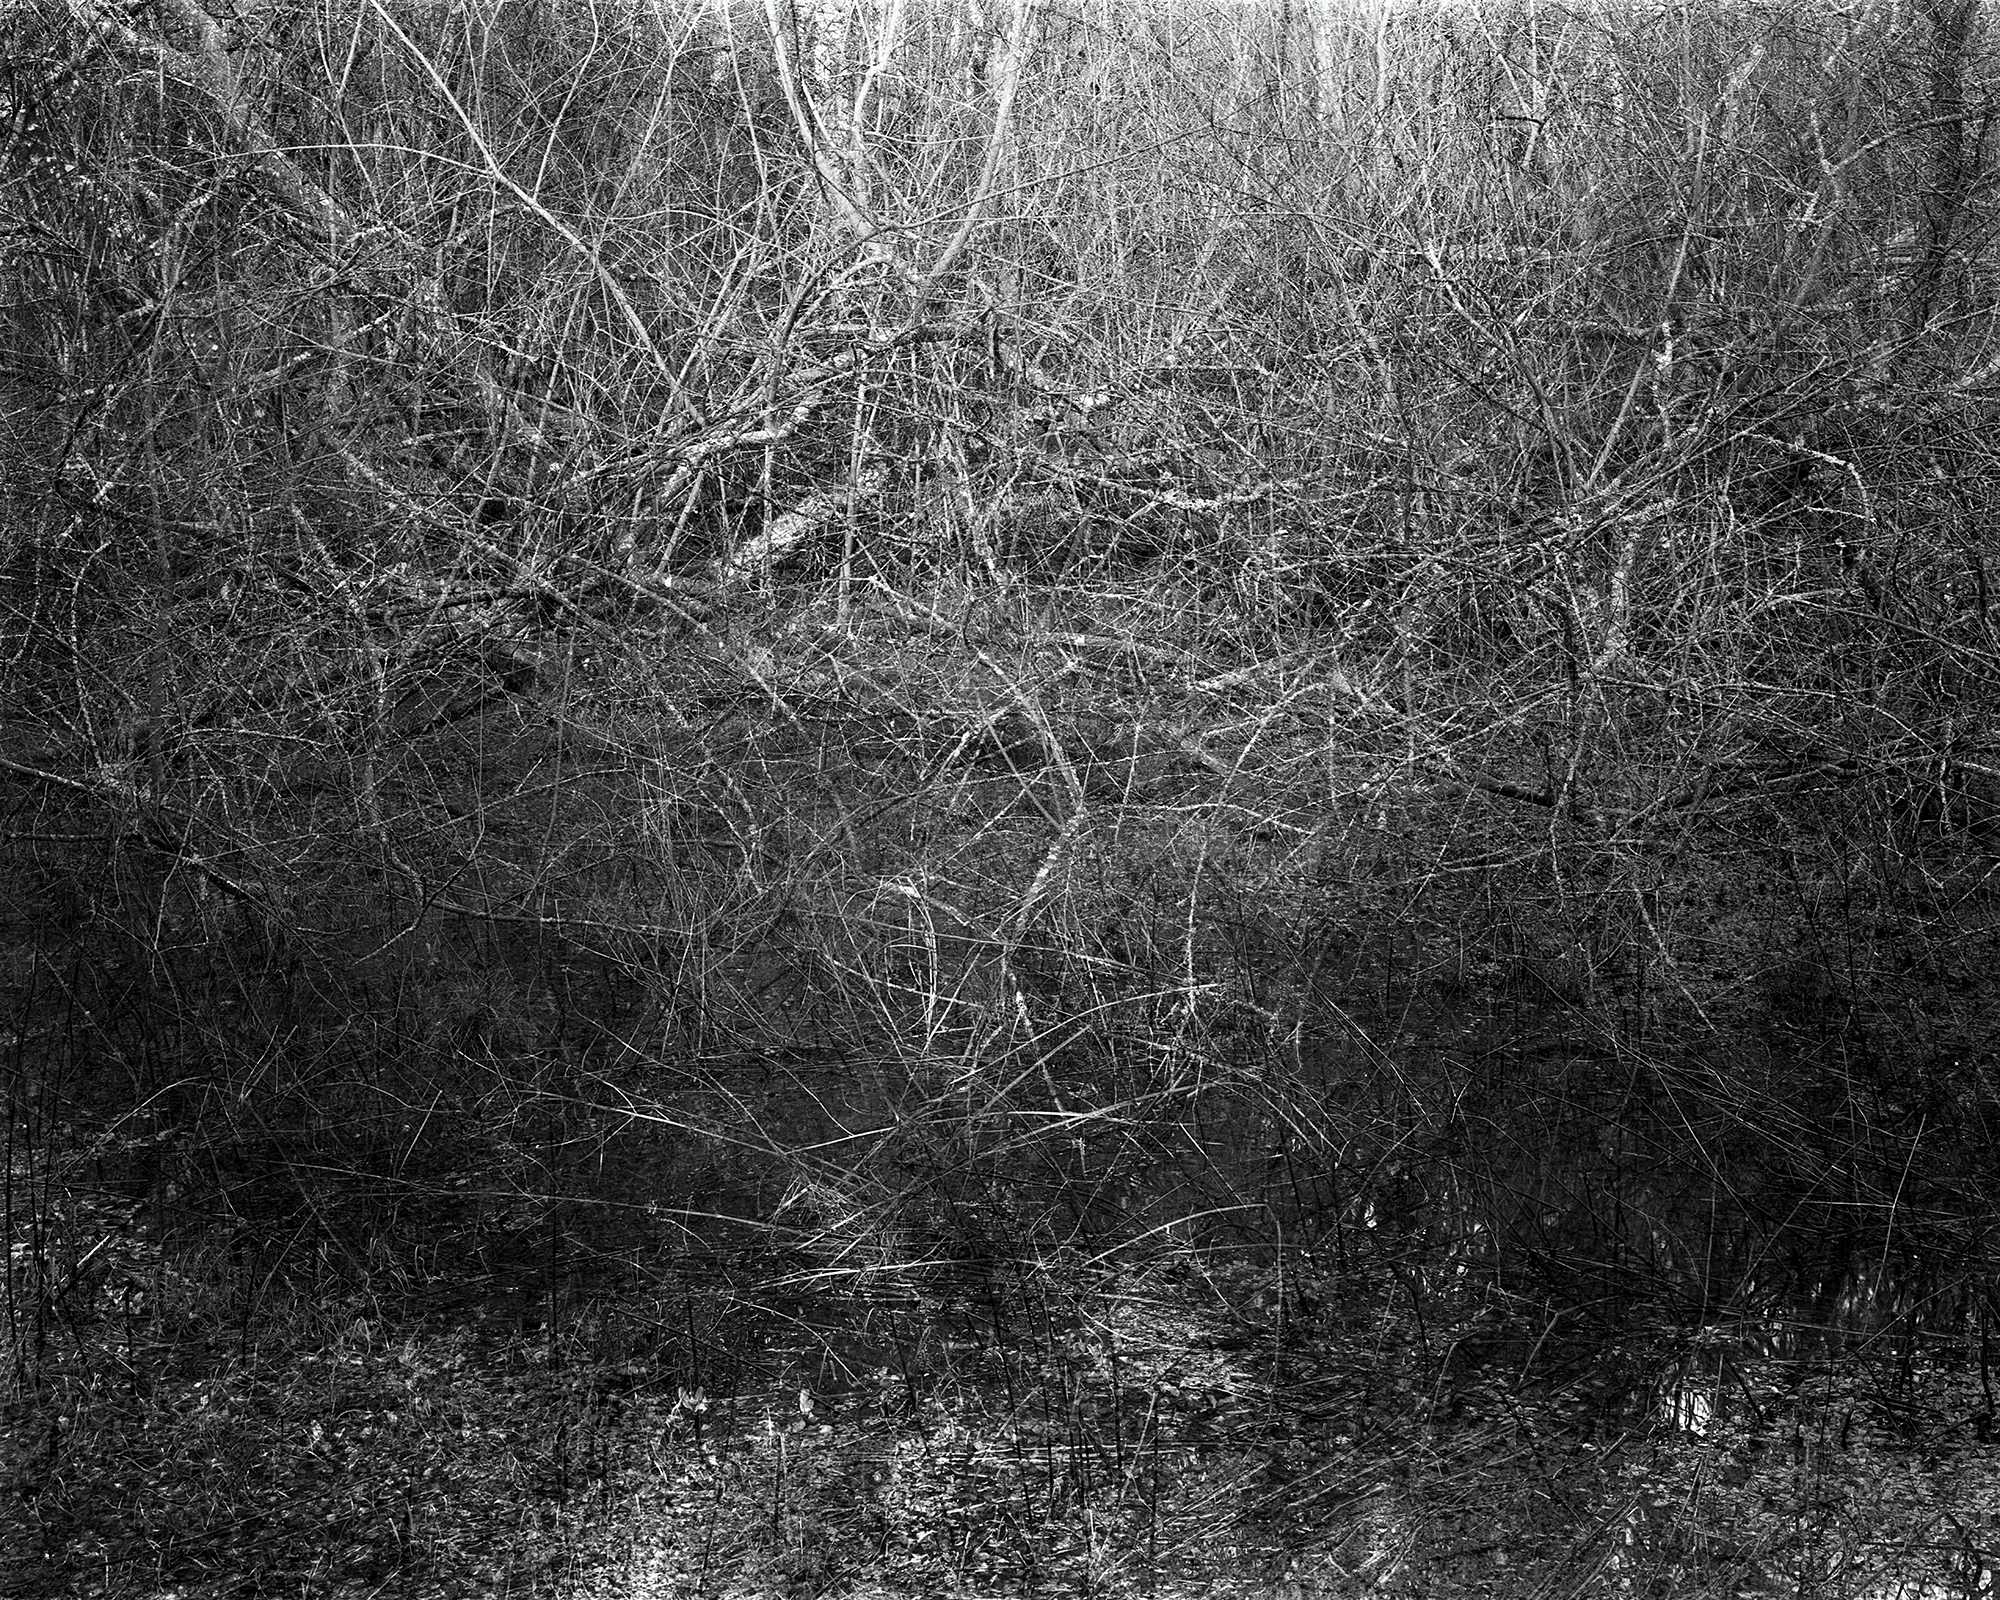 Photograph: Jonty Sale, 'SQUALLSMIRE #6'